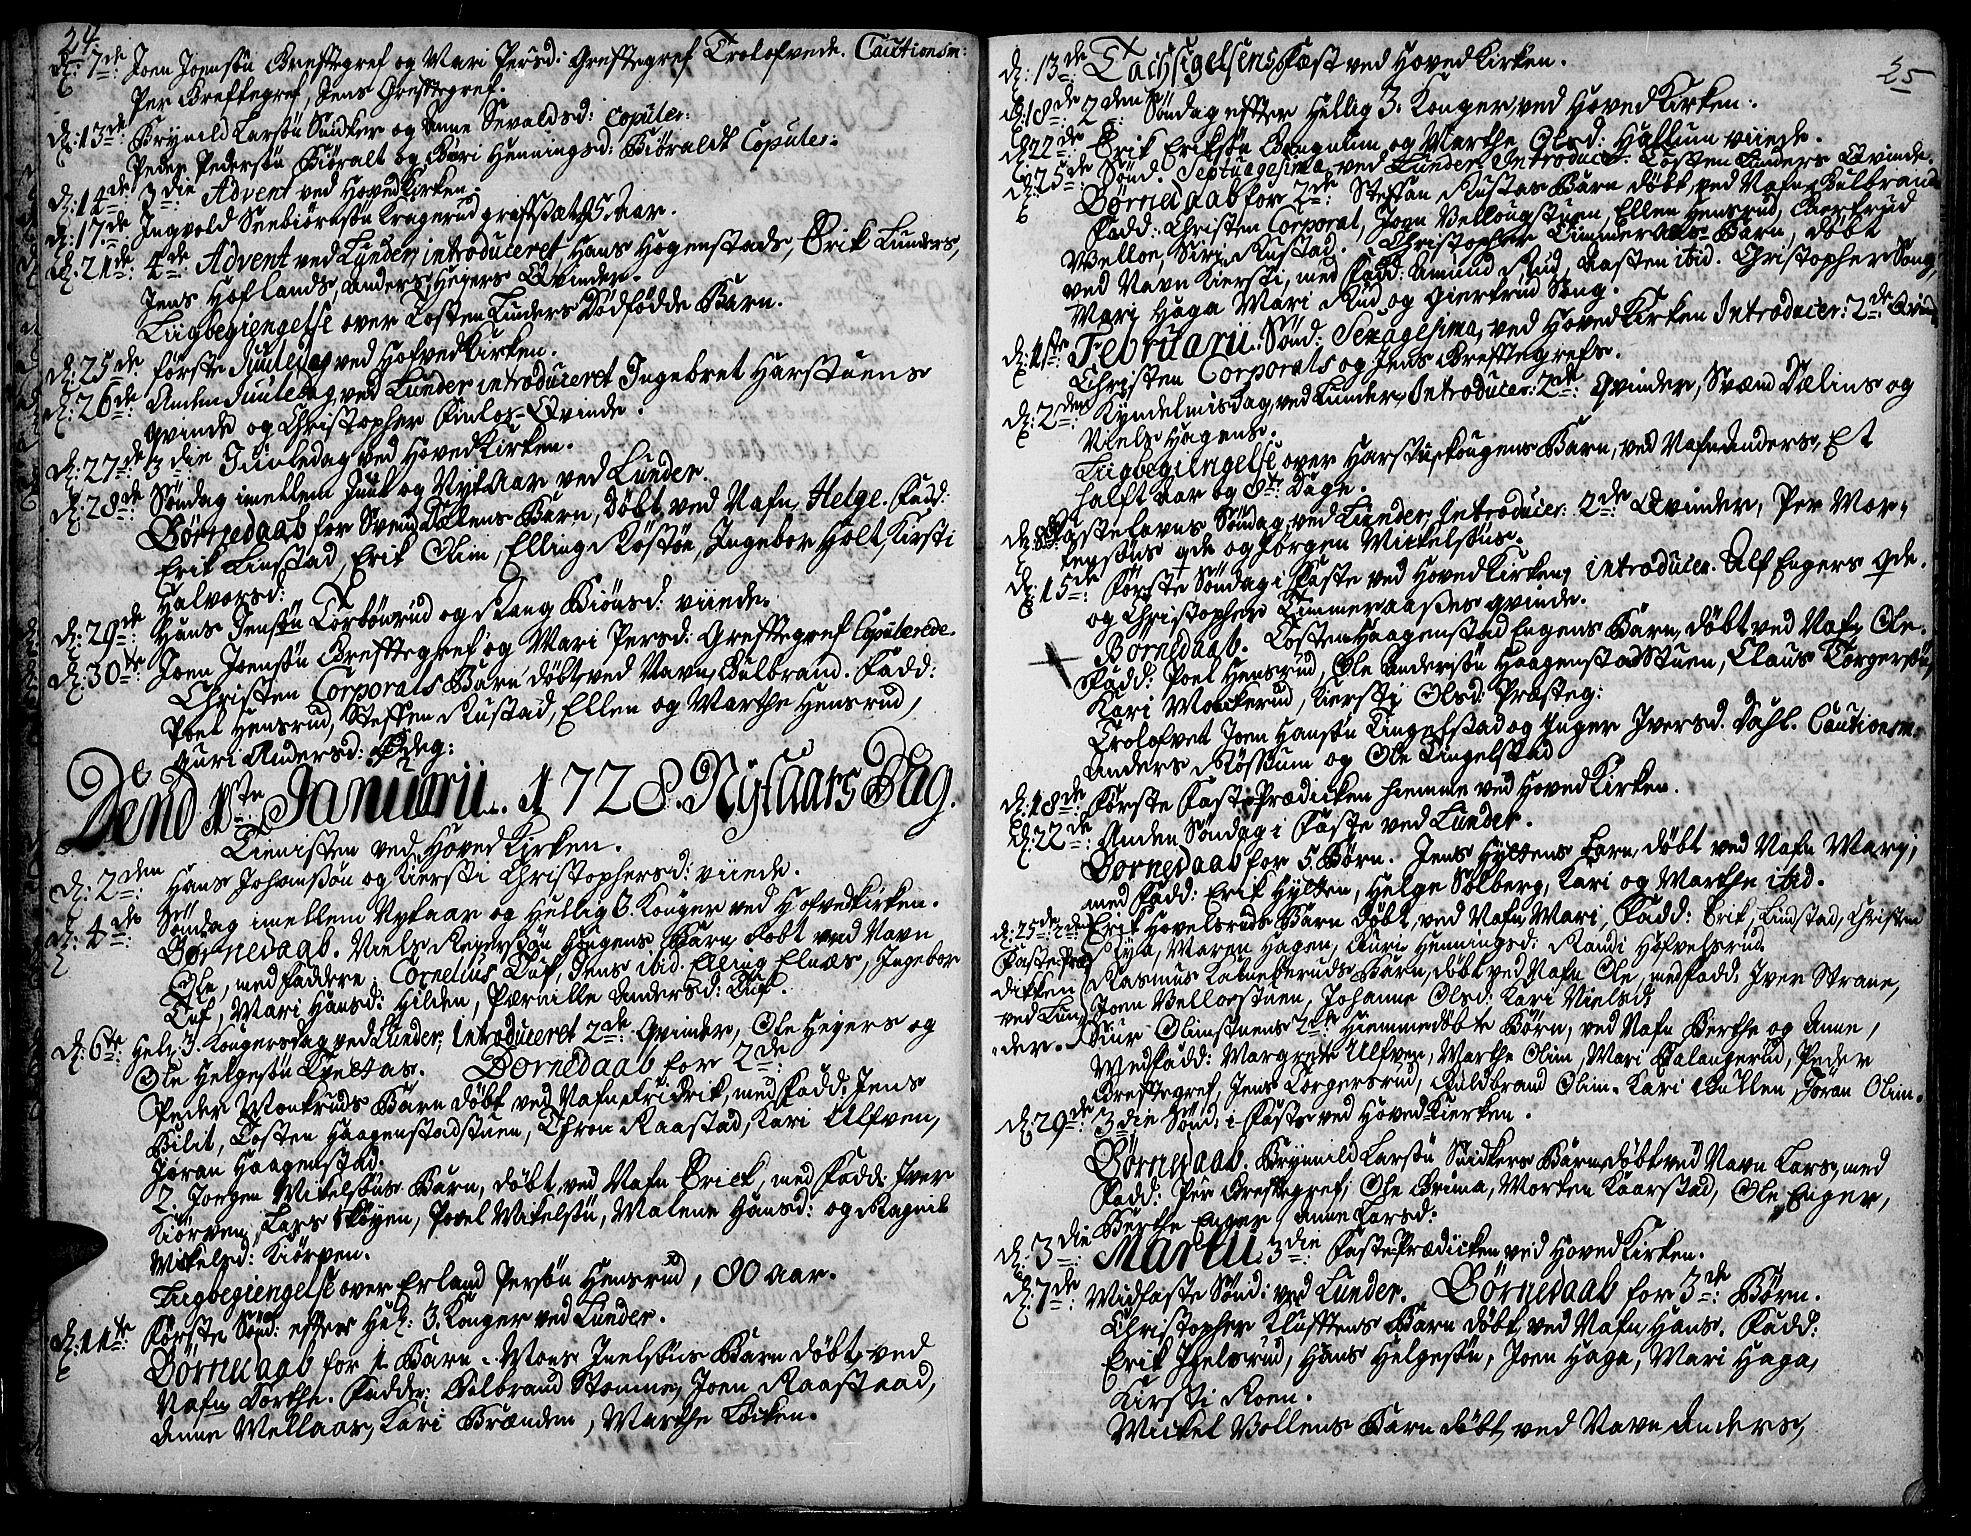 SAH, Jevnaker prestekontor, Ministerialbok nr. 2, 1725-1751, s. 24-25